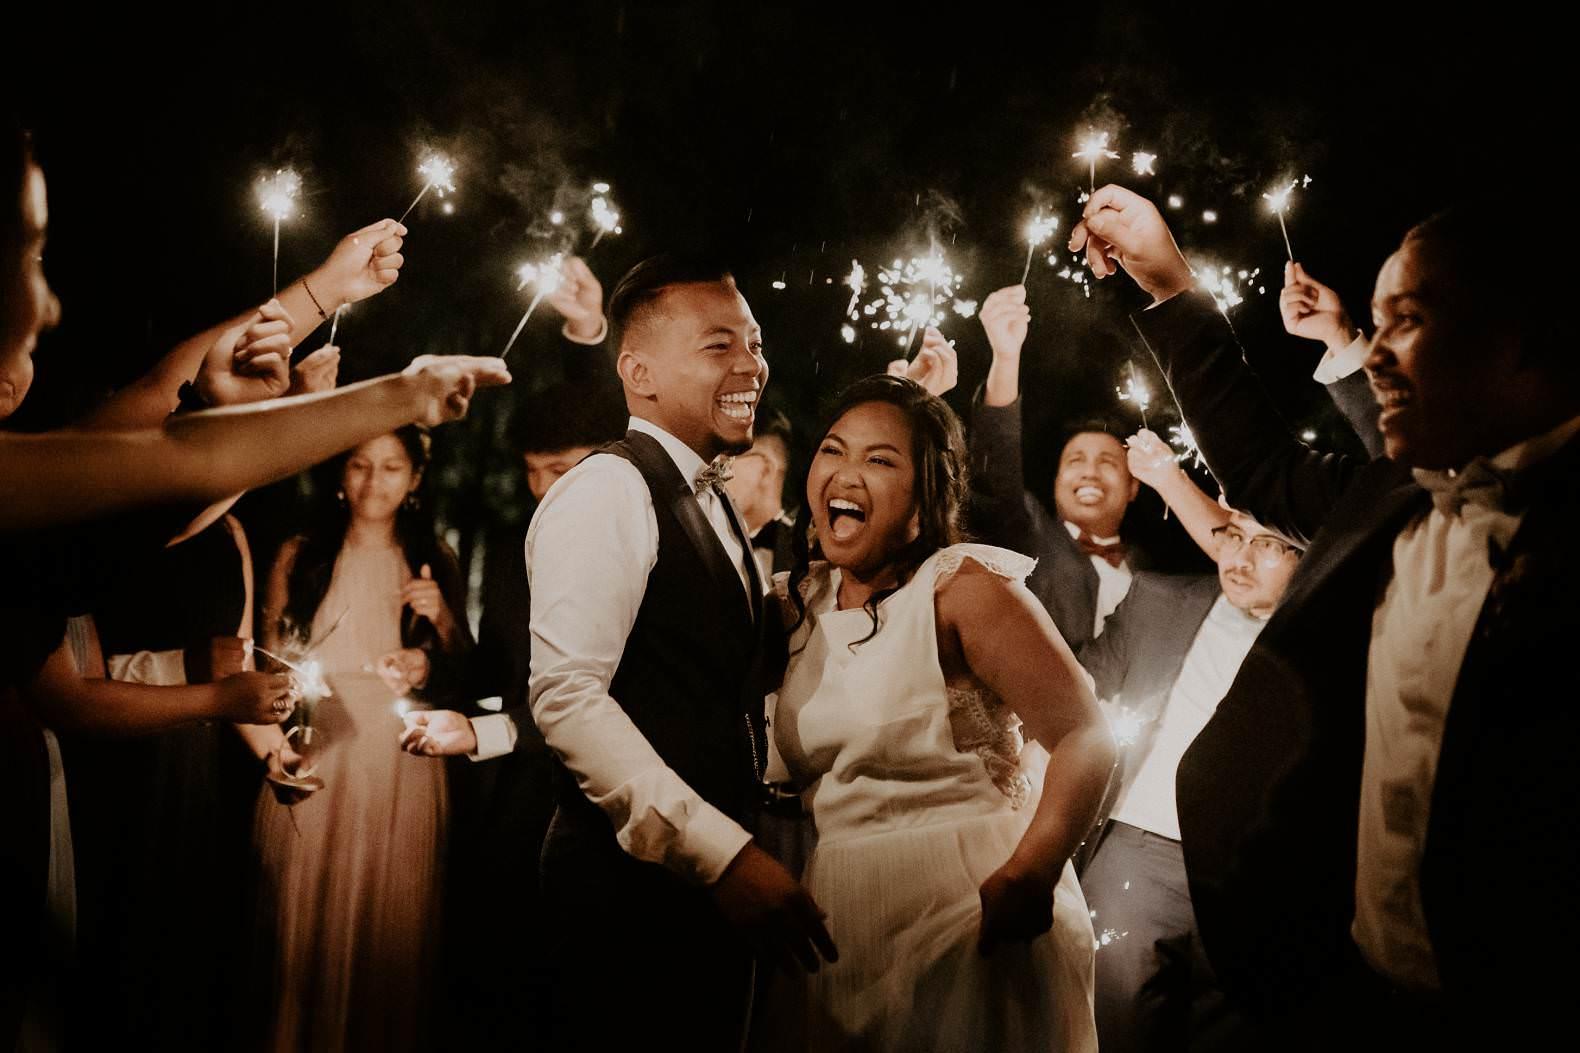 mariage manoir de corny photographe bel esprit 0073 1